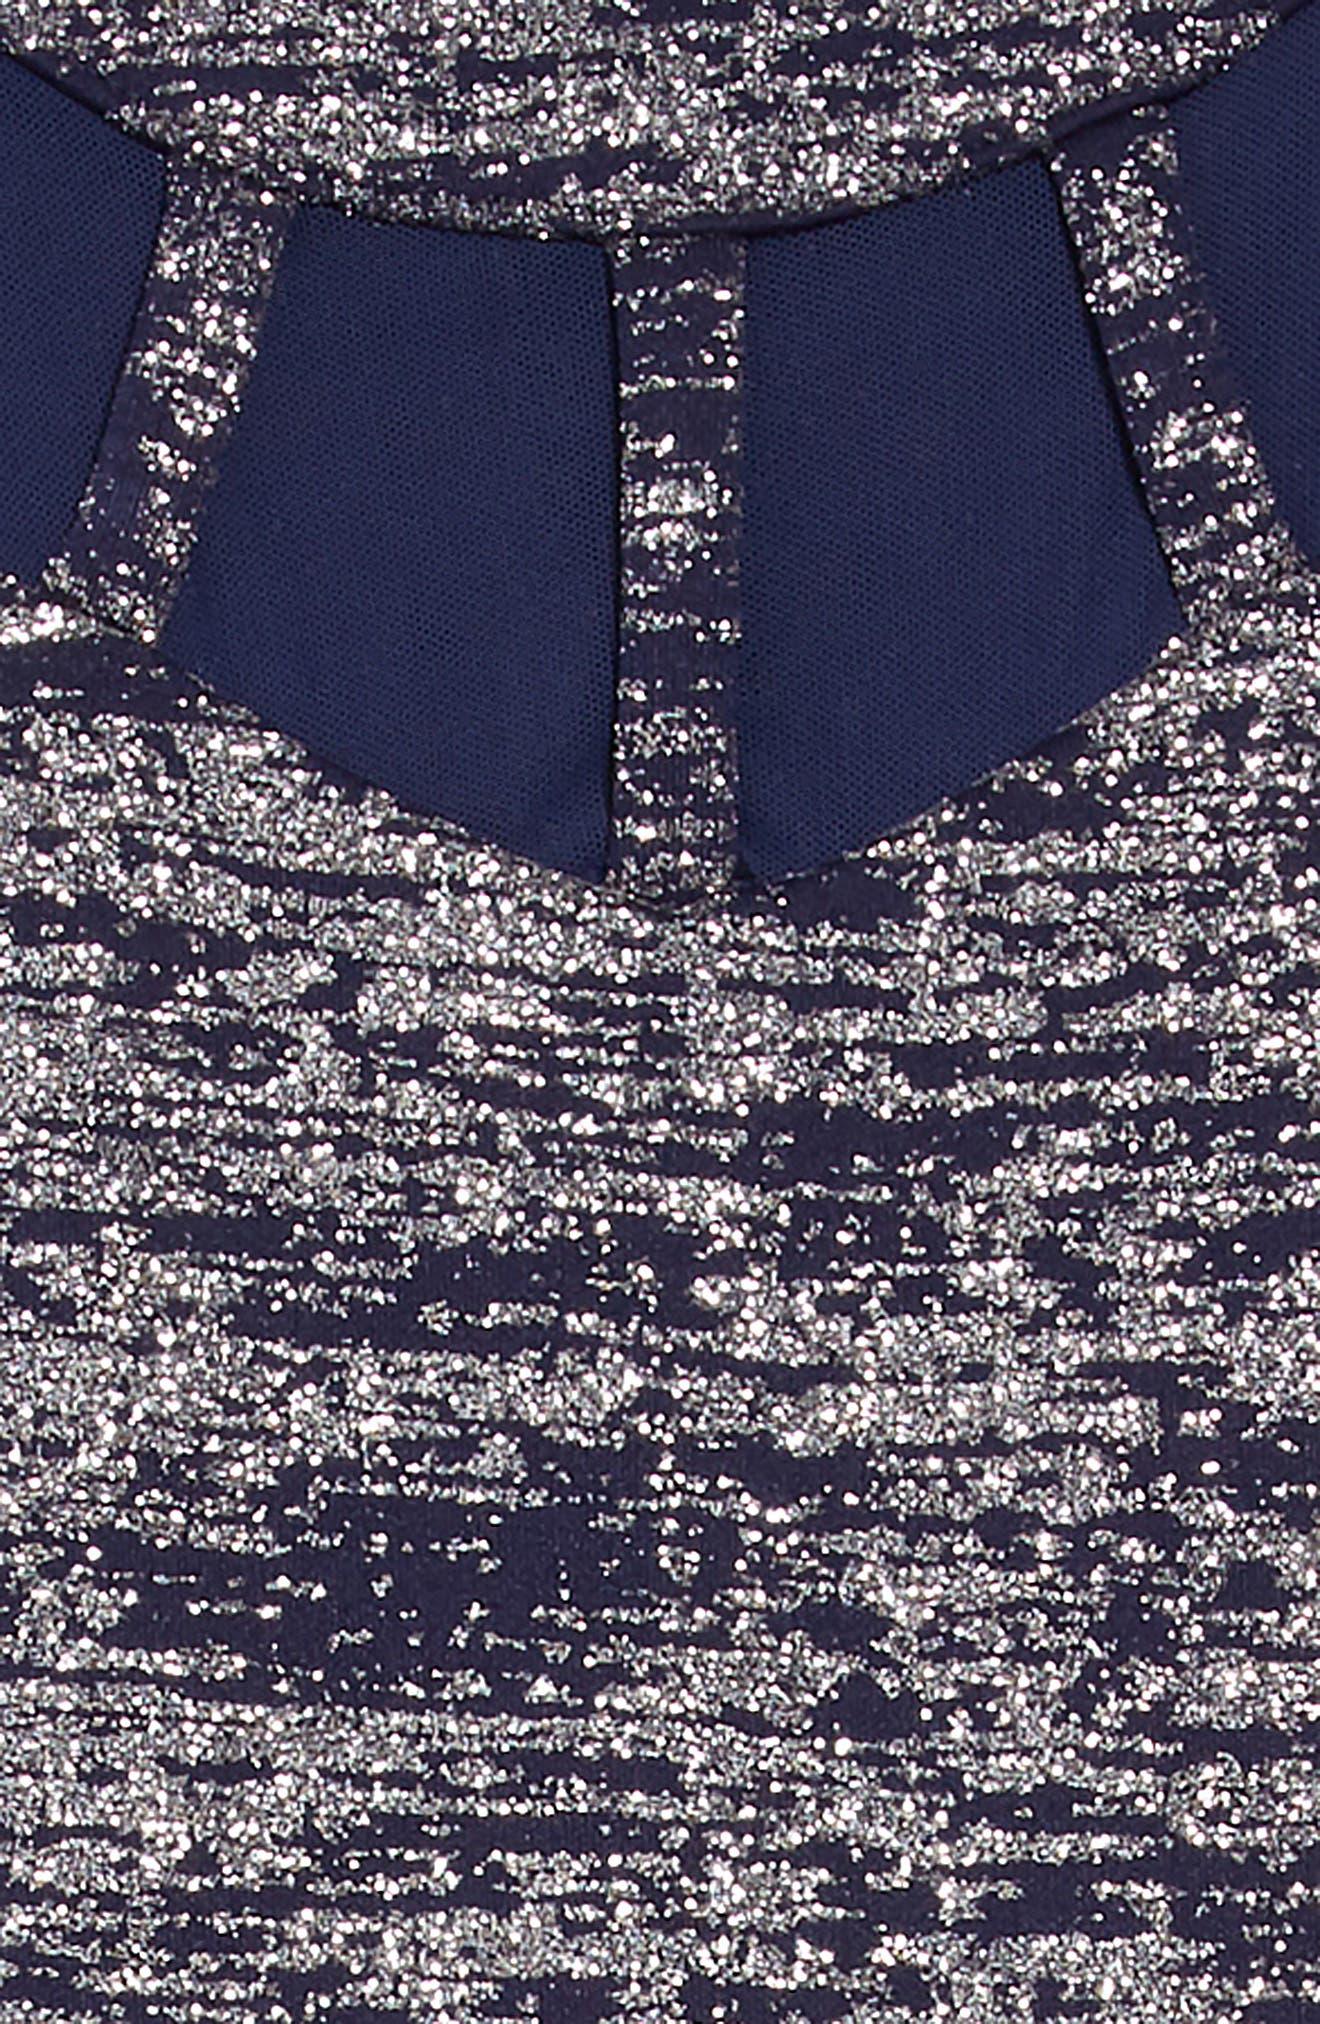 Glitter Illusion Neck Scuba Dress,                             Alternate thumbnail 3, color,                             NAVY/ SILVER